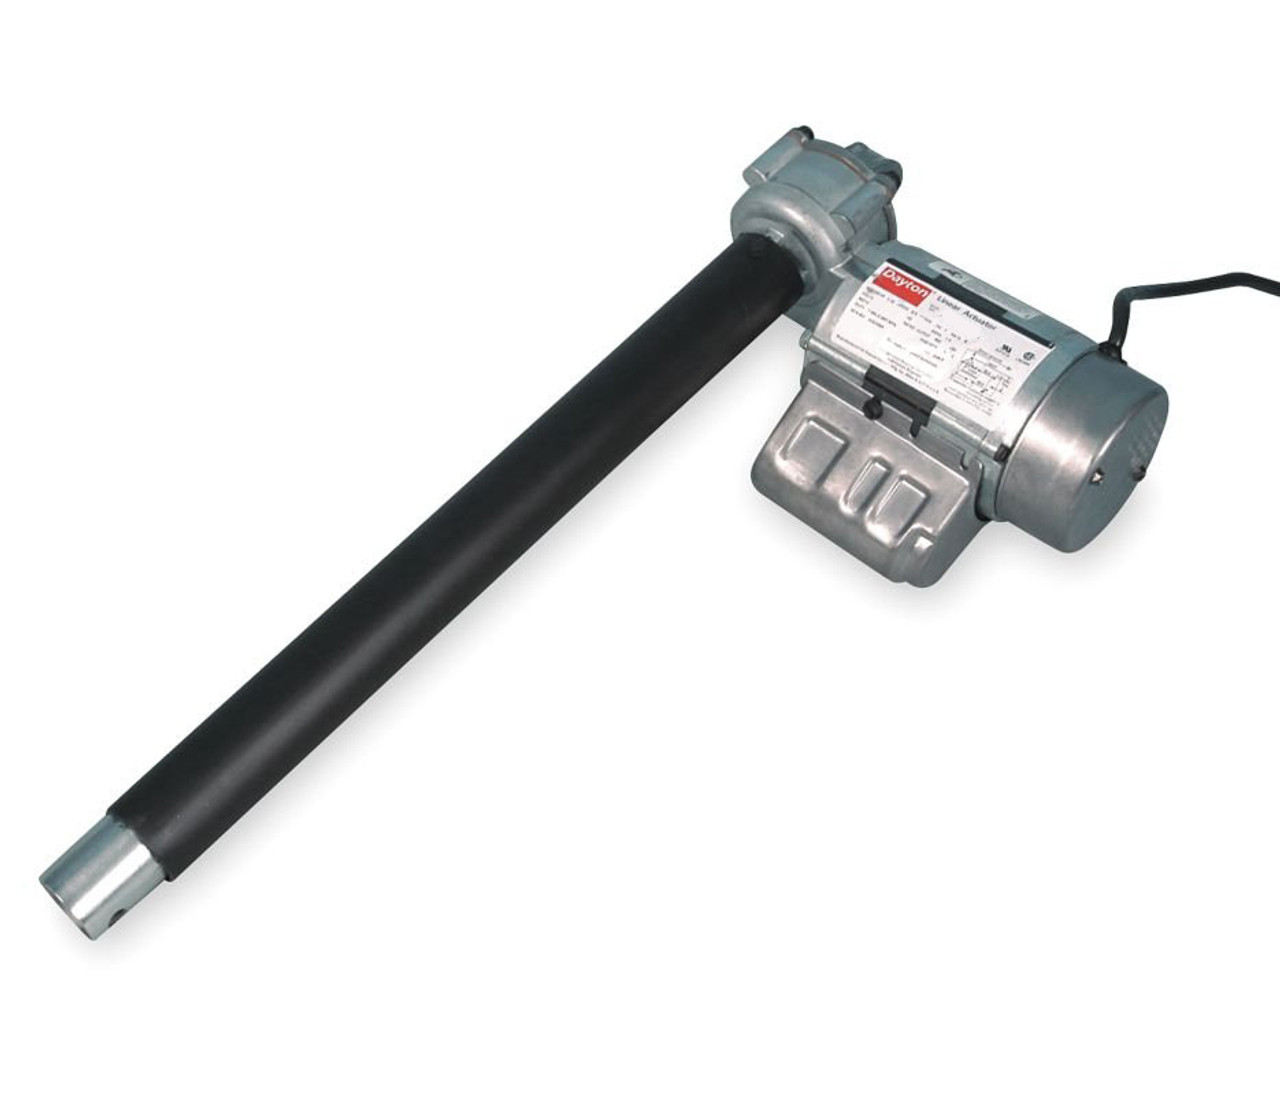 Linear Actuator  115vac  300 Lb Load  Dayton   1xfy1